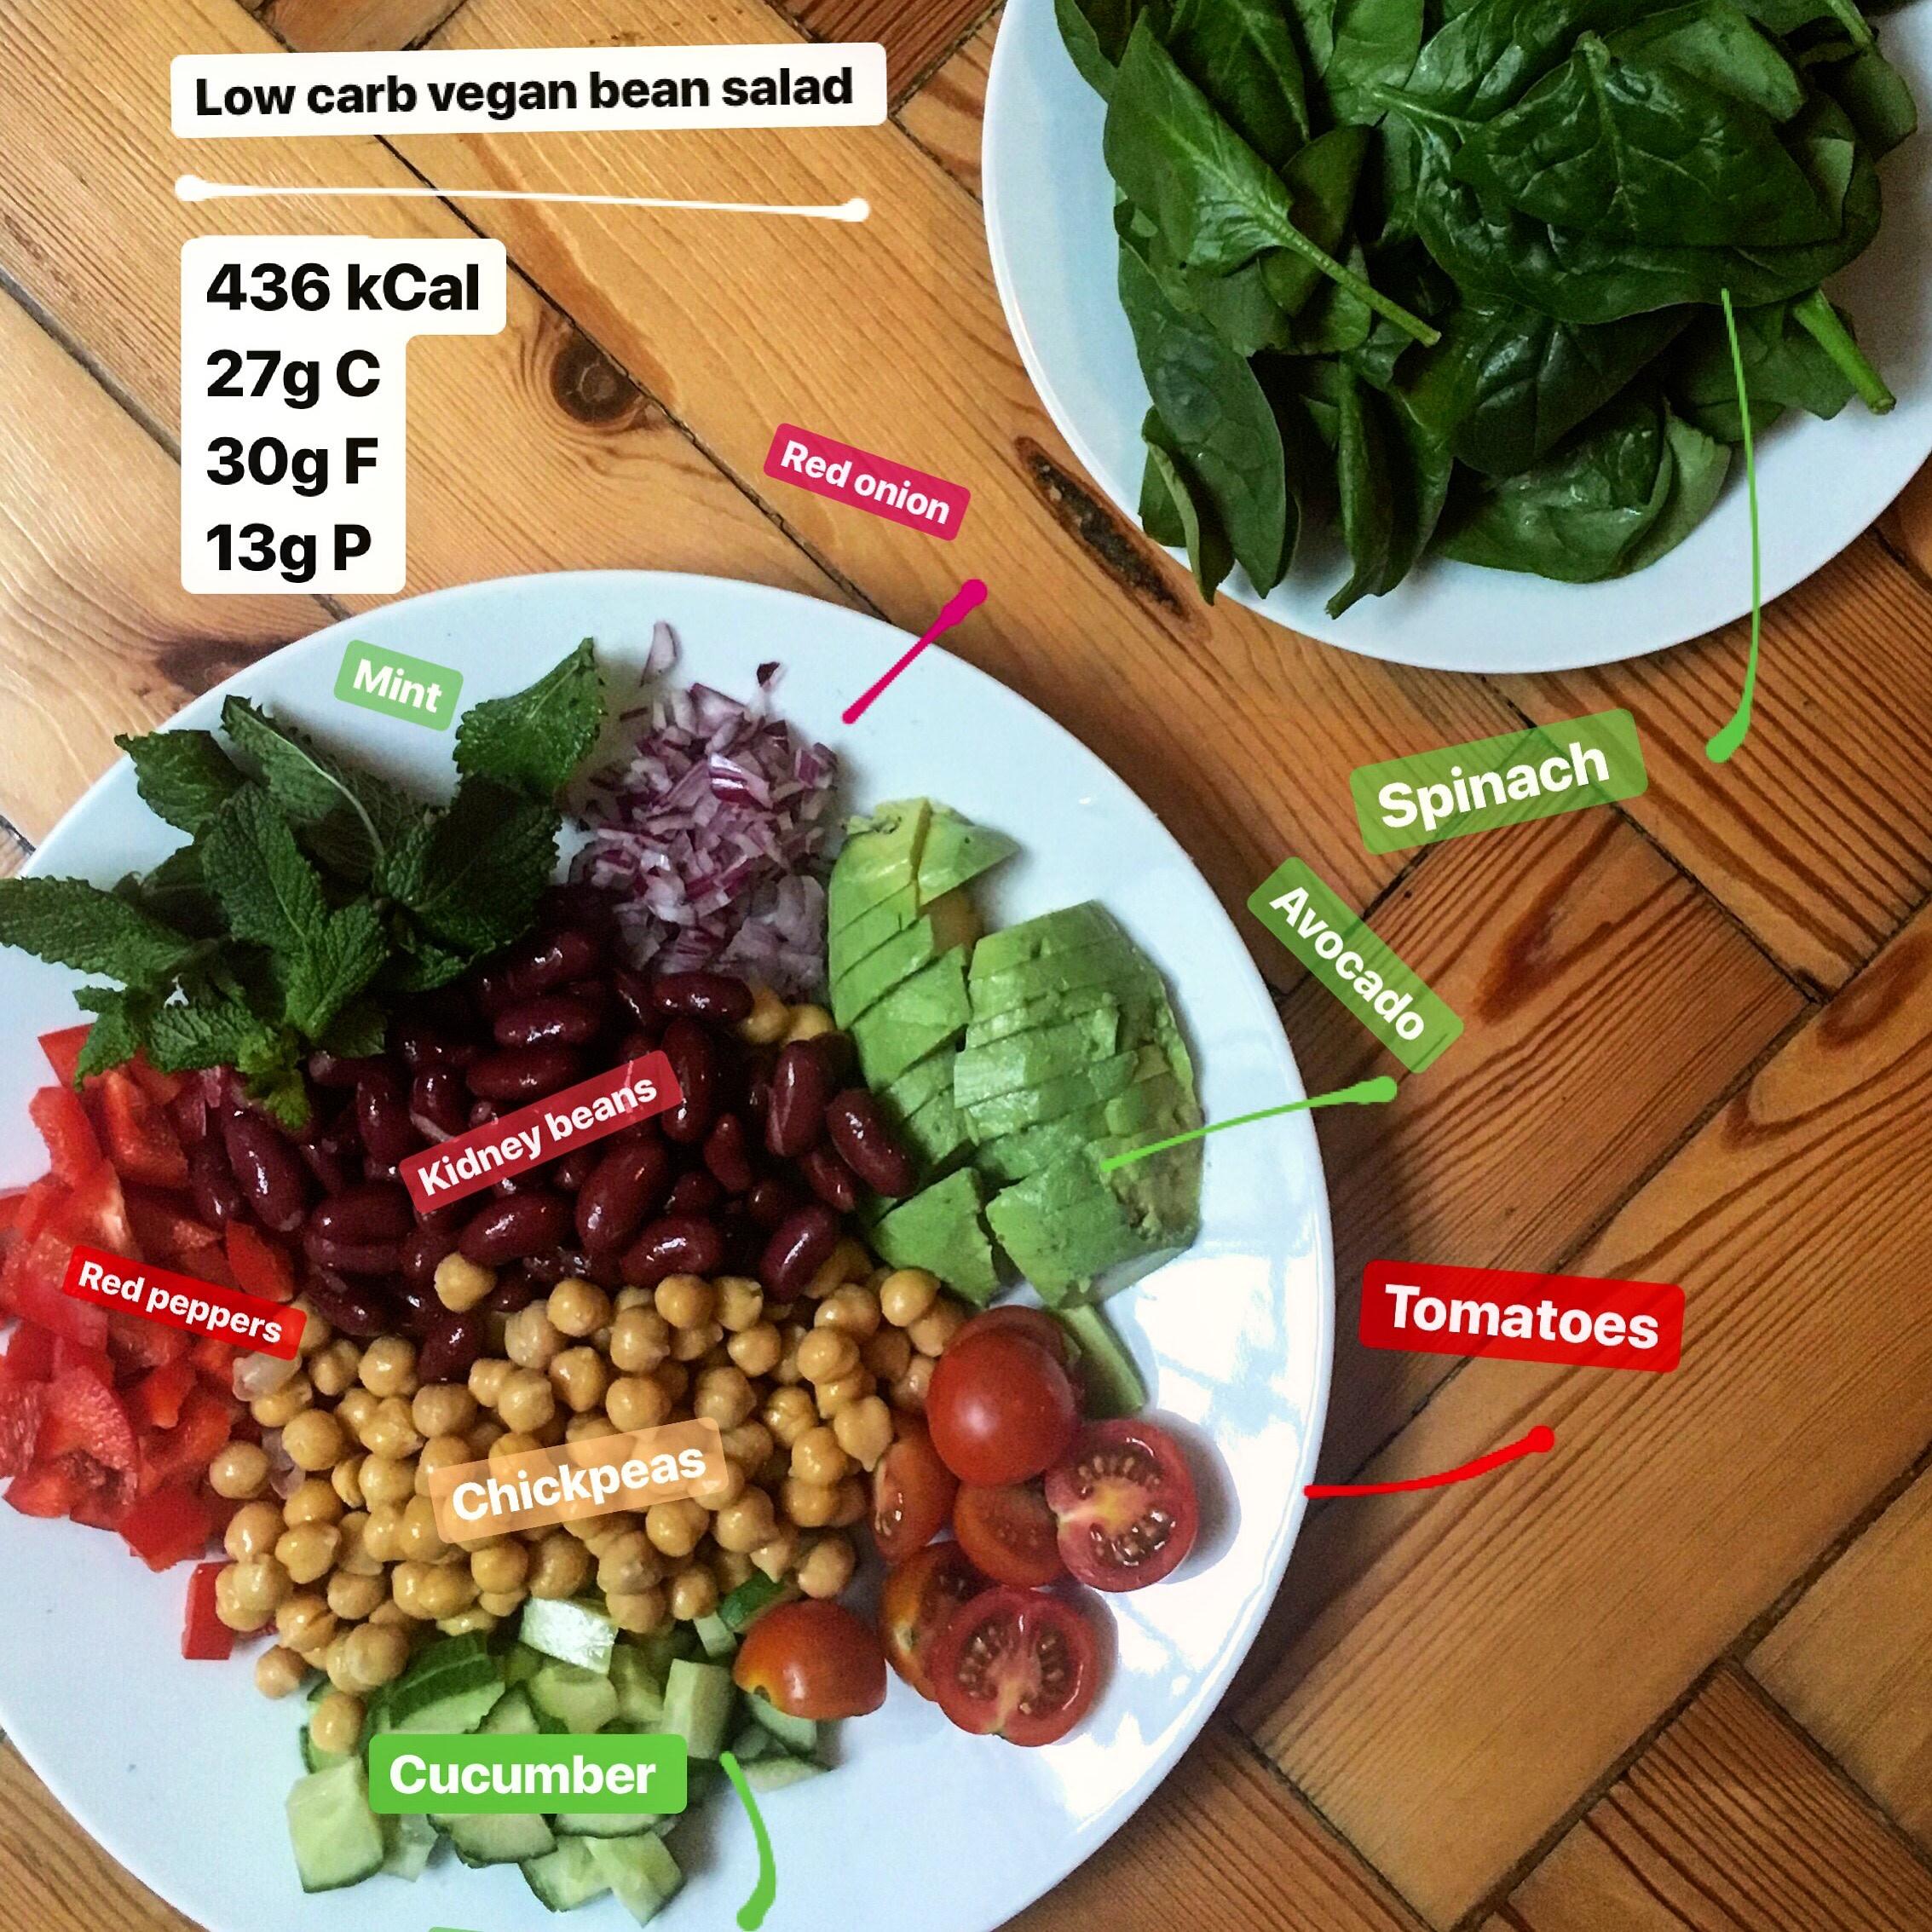 lower carb vegan diet